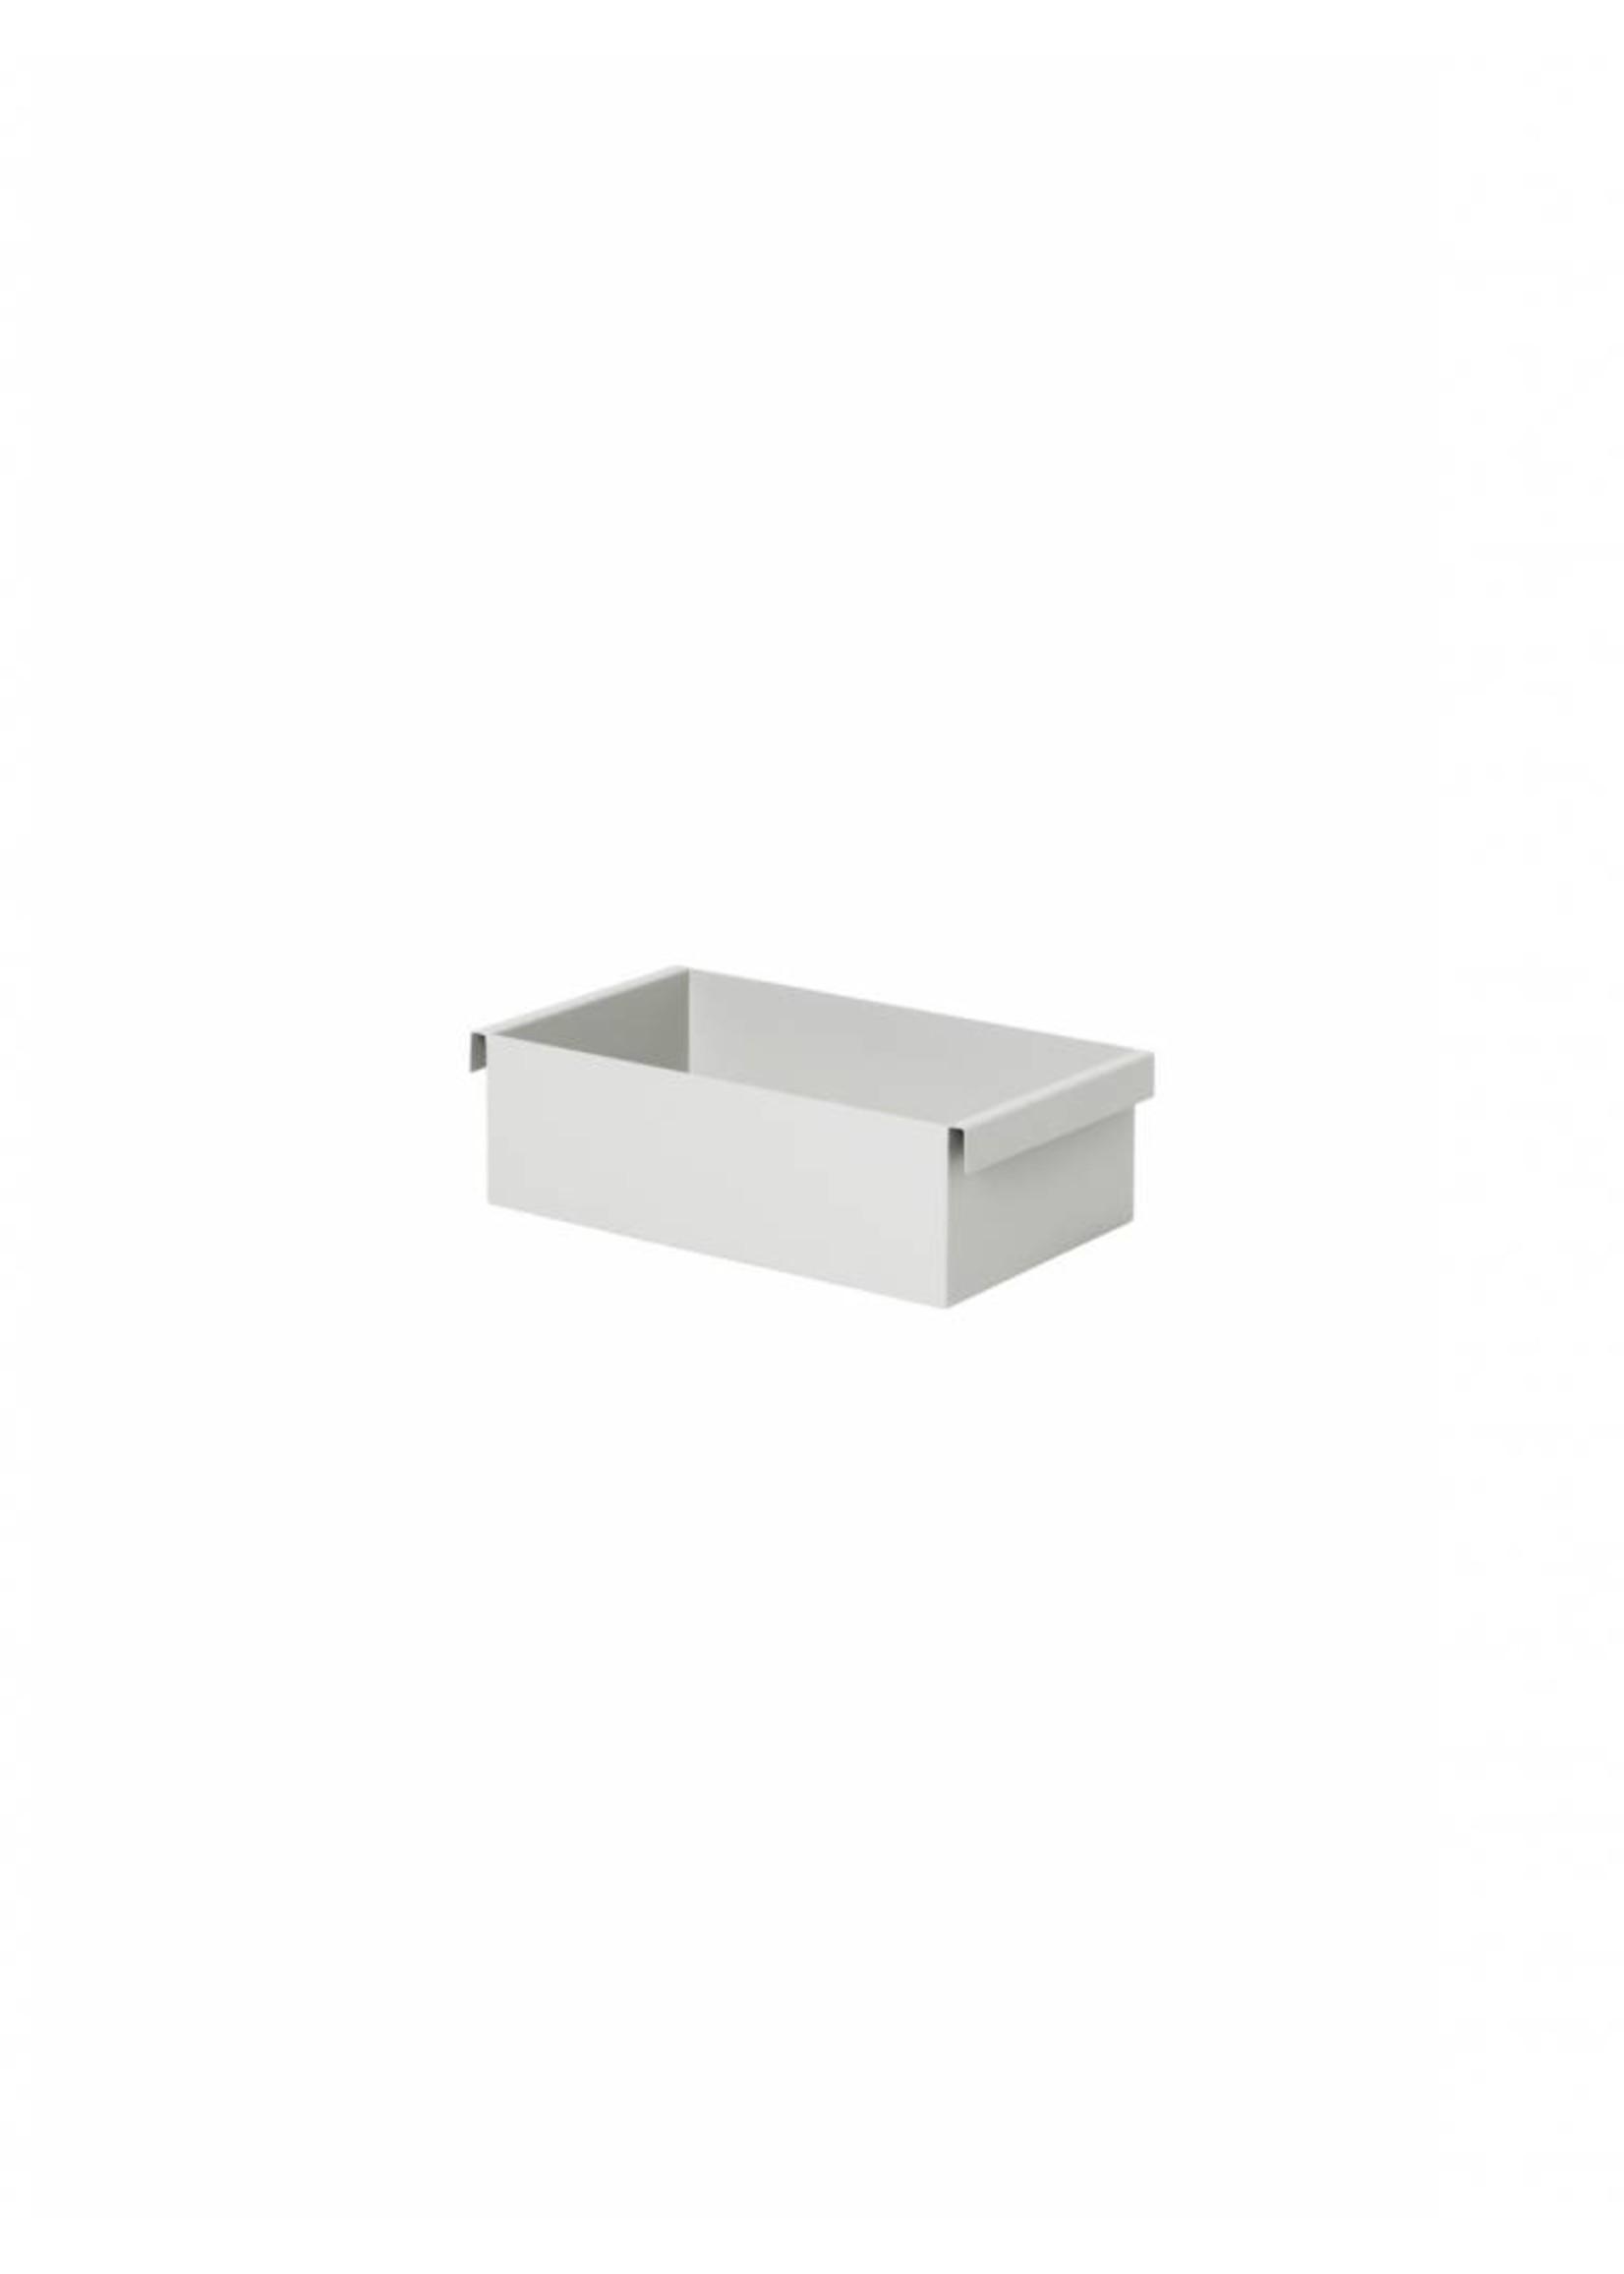 ferm LIVING ferm LIVING Plant Box Container - Grey